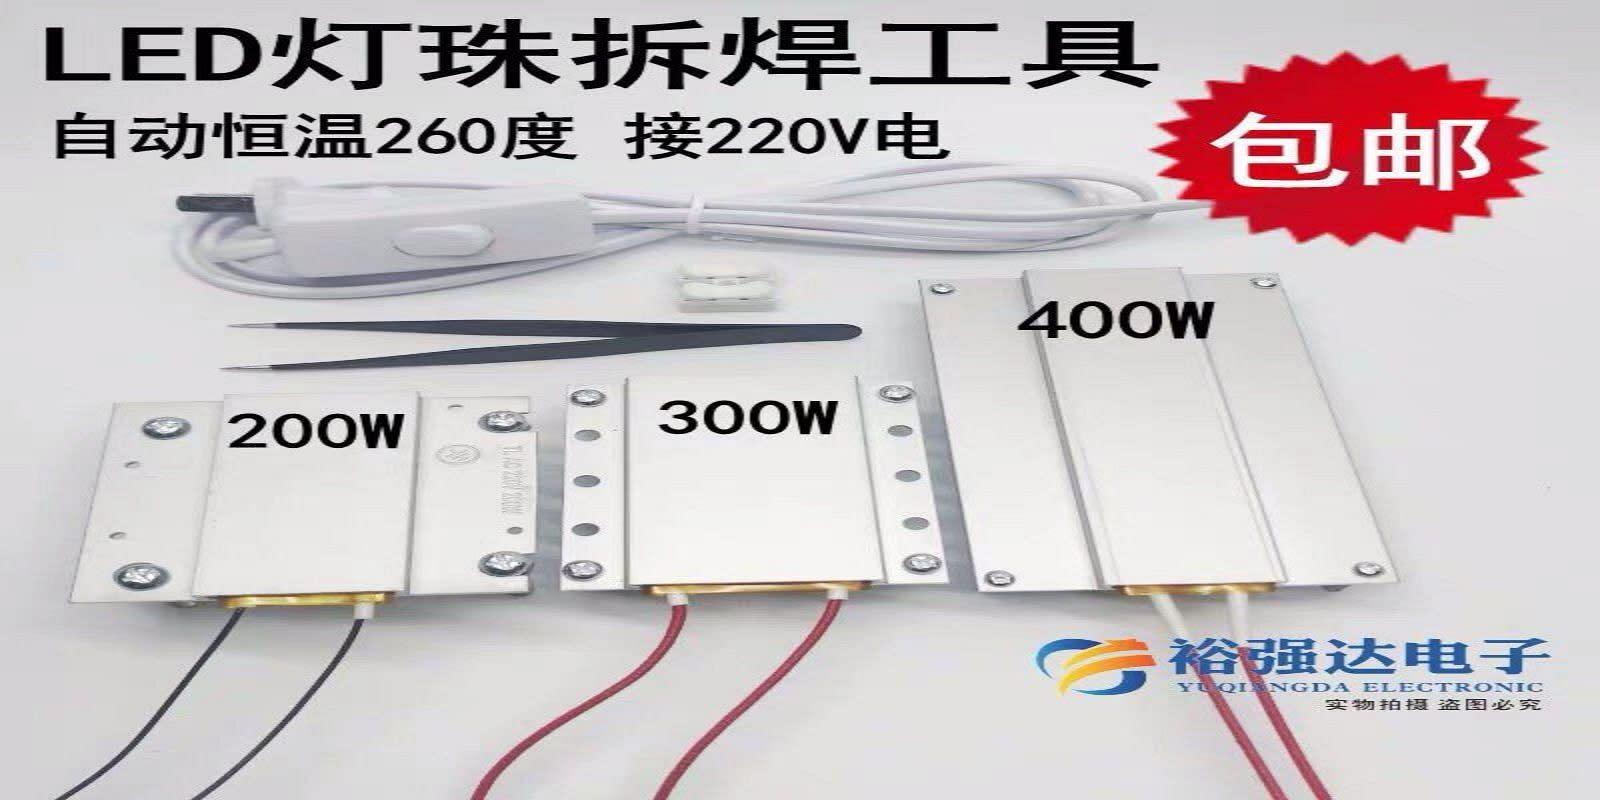 LED燈珠拆焊臺電熱板